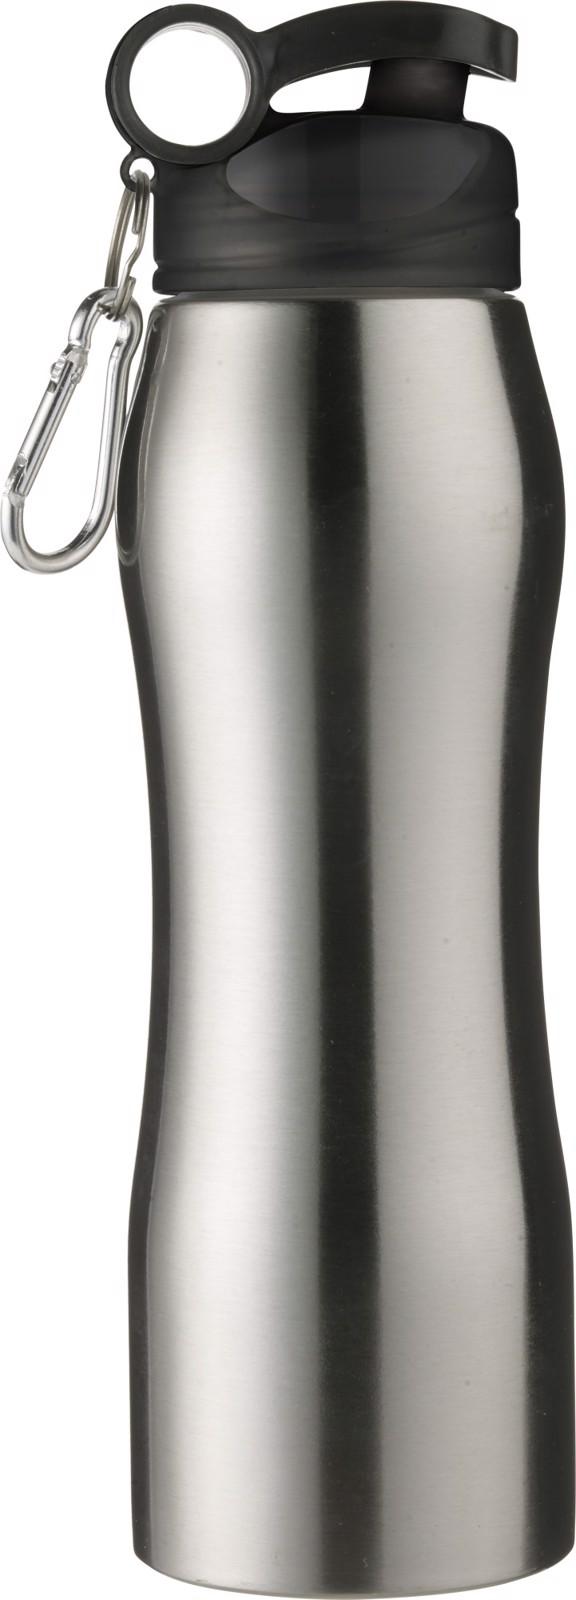 Stainless steelbottle - Silver